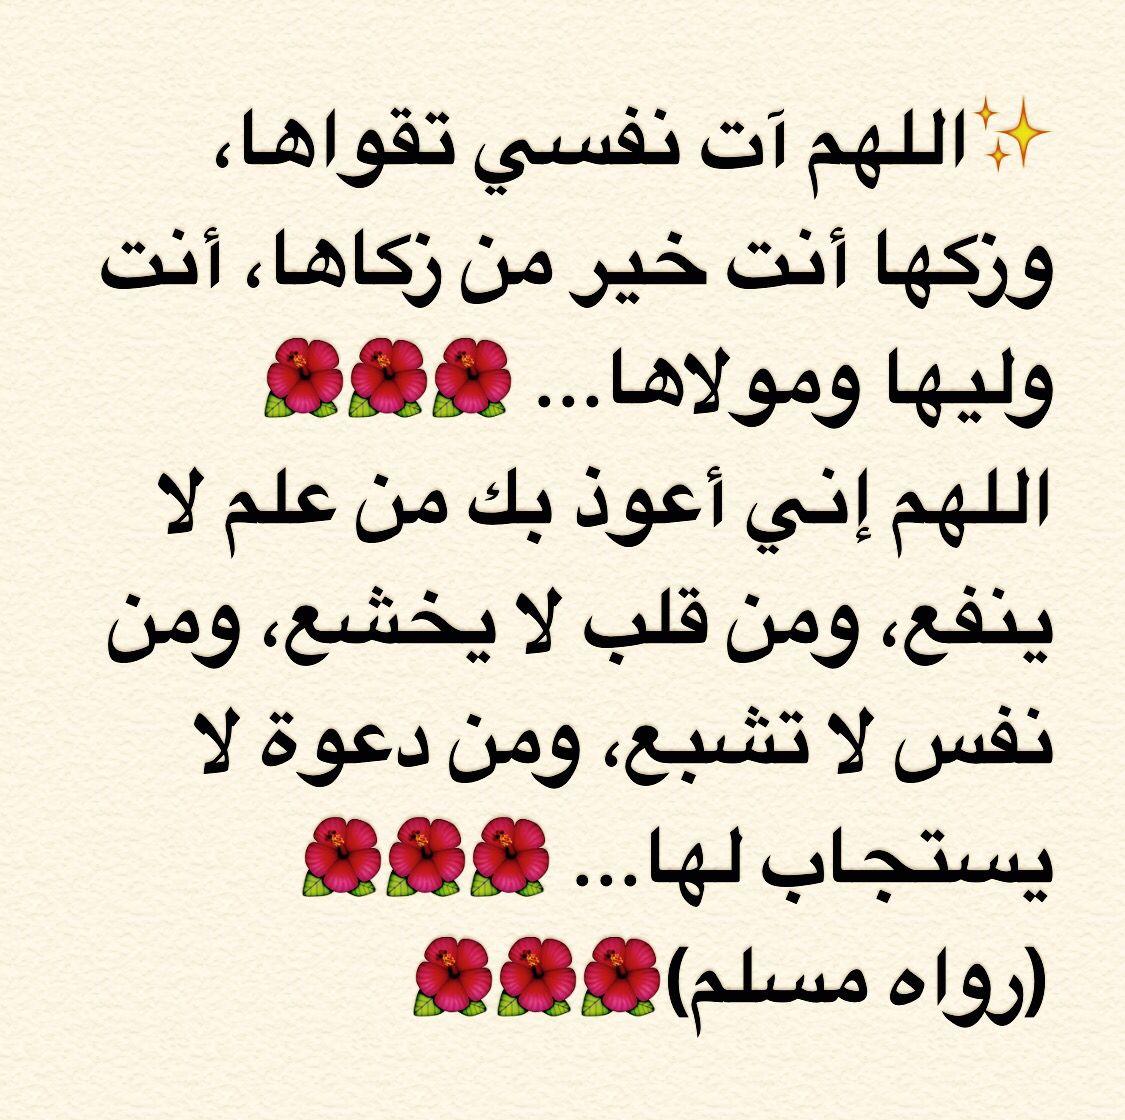 Desertrose من دعاء نبينا محمد صلى الله عليه وسلم Arabic Calligraphy Calligraphy